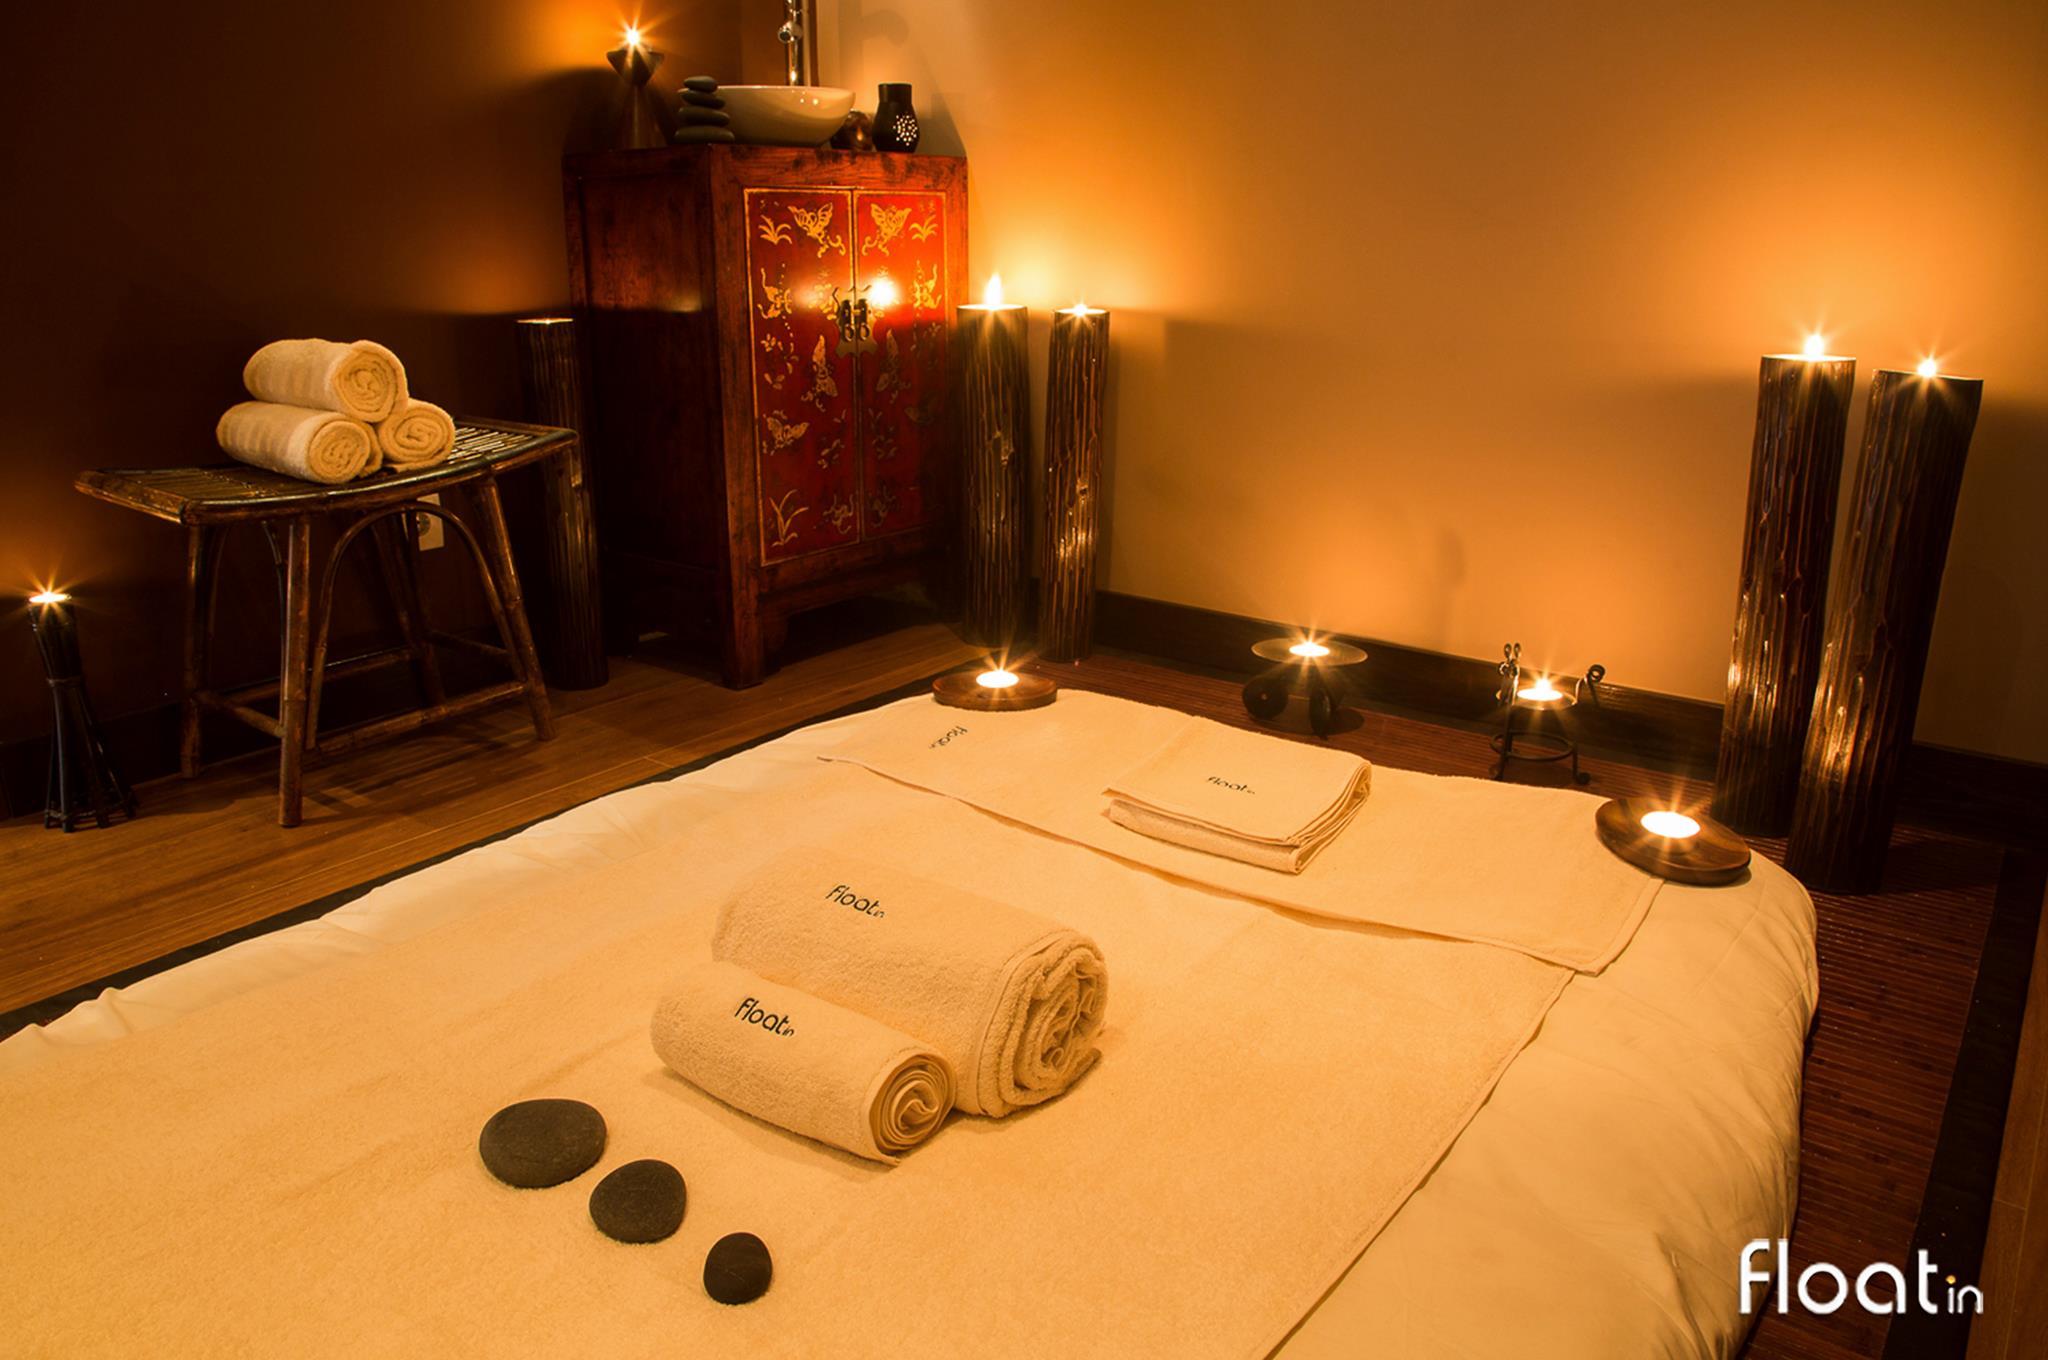 Spa Float In - Salle de Massage - Lisbonne